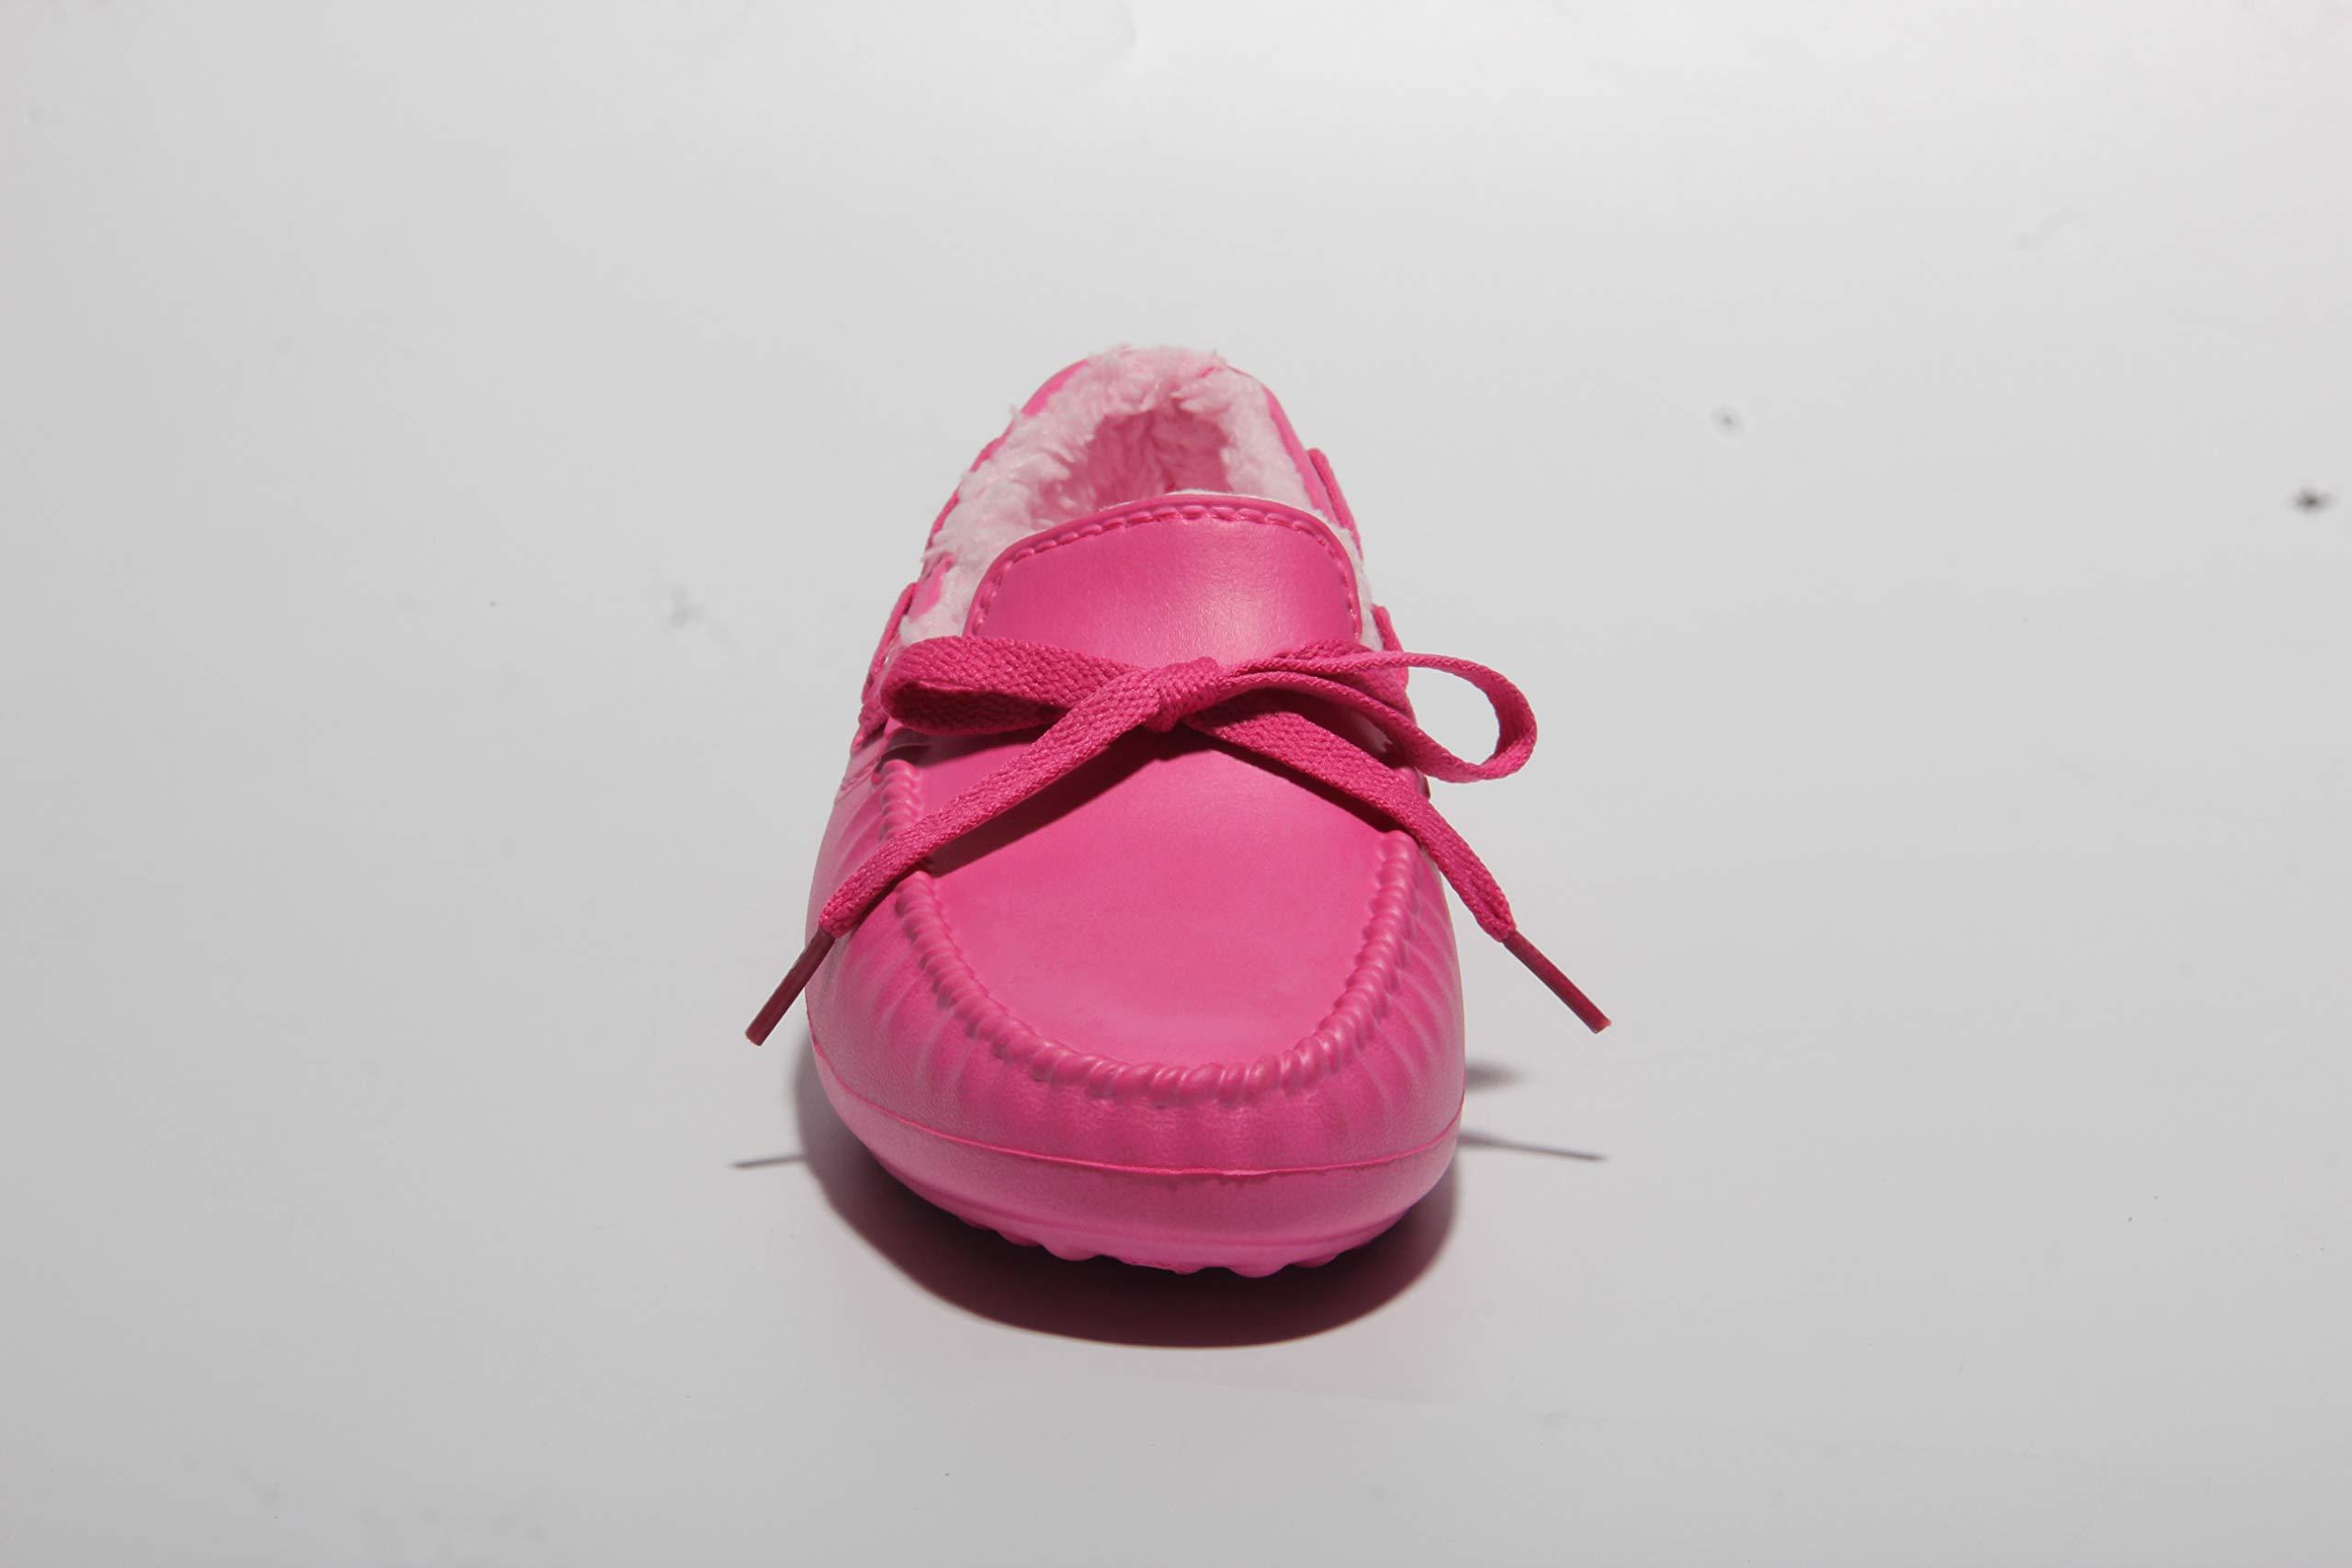 Women\'s Warm Comfy Velvet Memory Foam Ballerina Slippers Plush Shallow Peas Closed Back House Shoes Indoor Floor Footwear Red